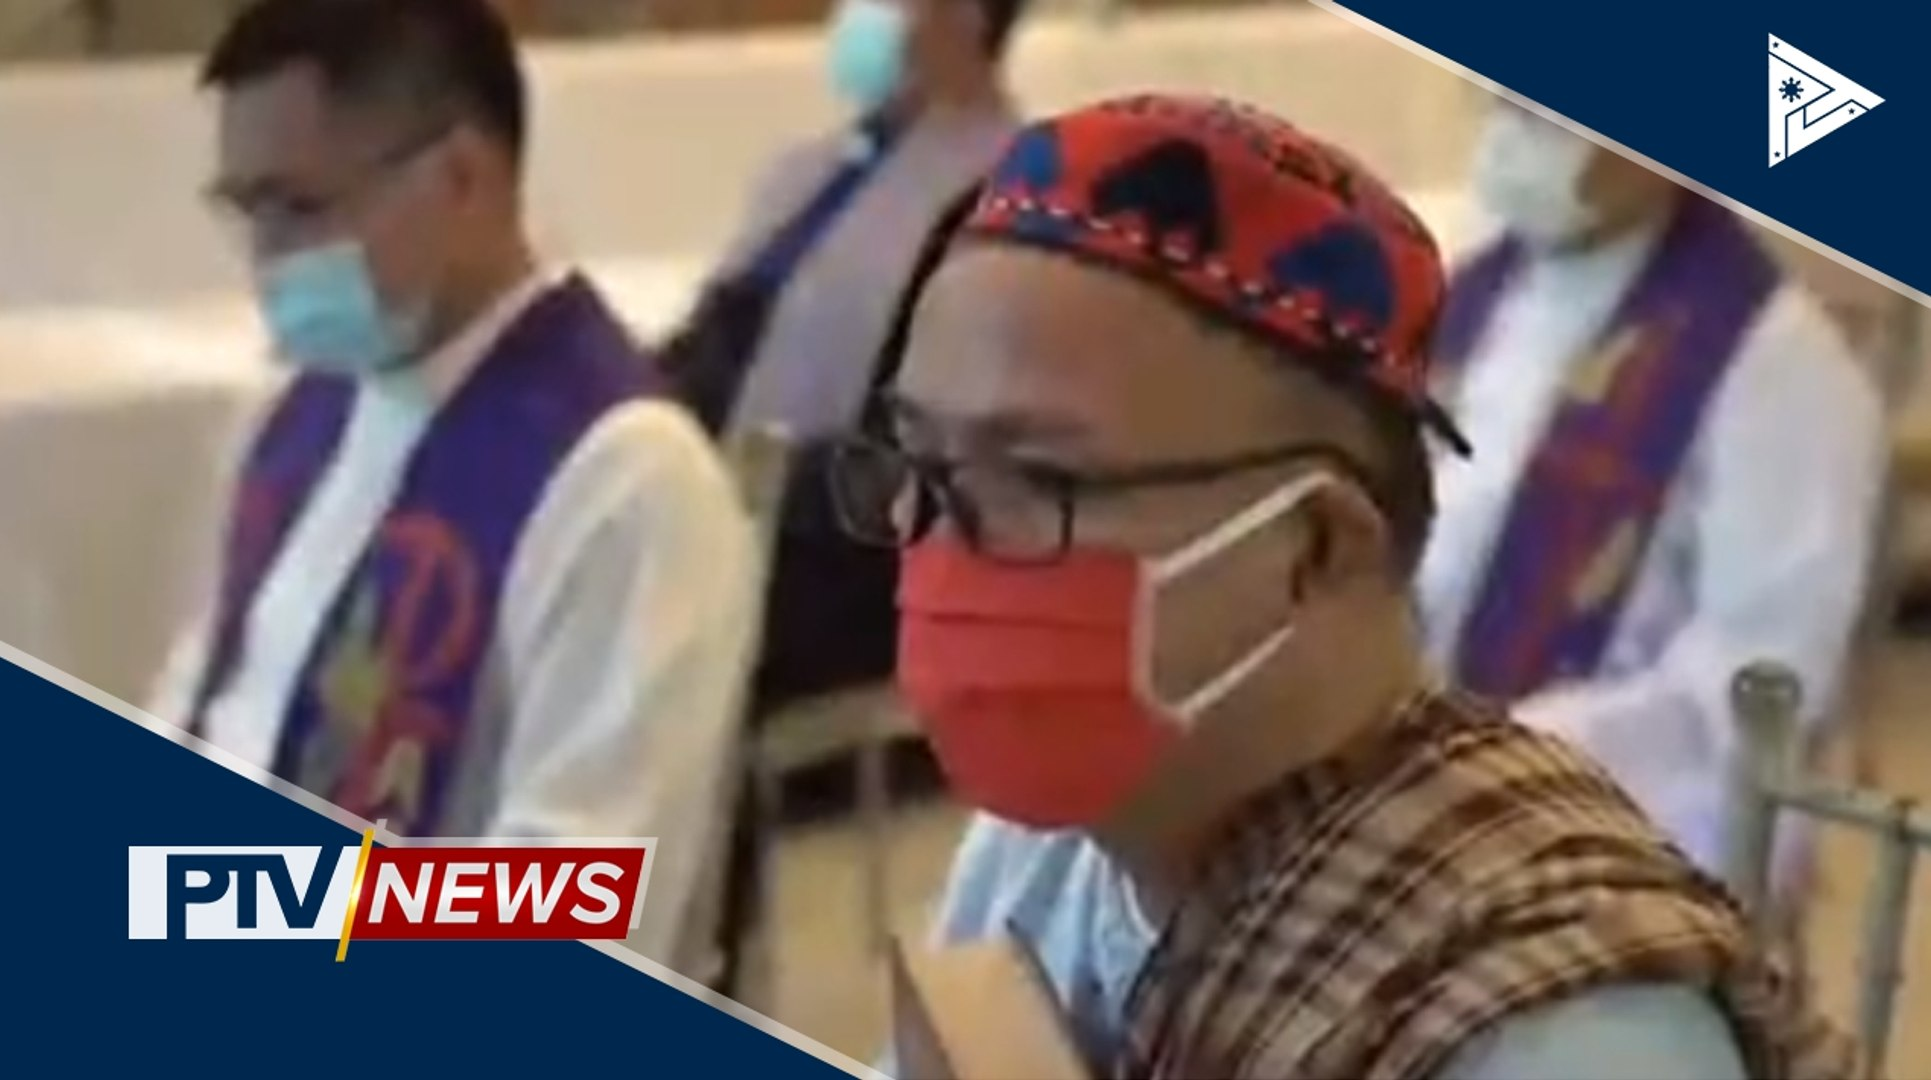 Religious groups, nagsagawa ng interfaith prayer